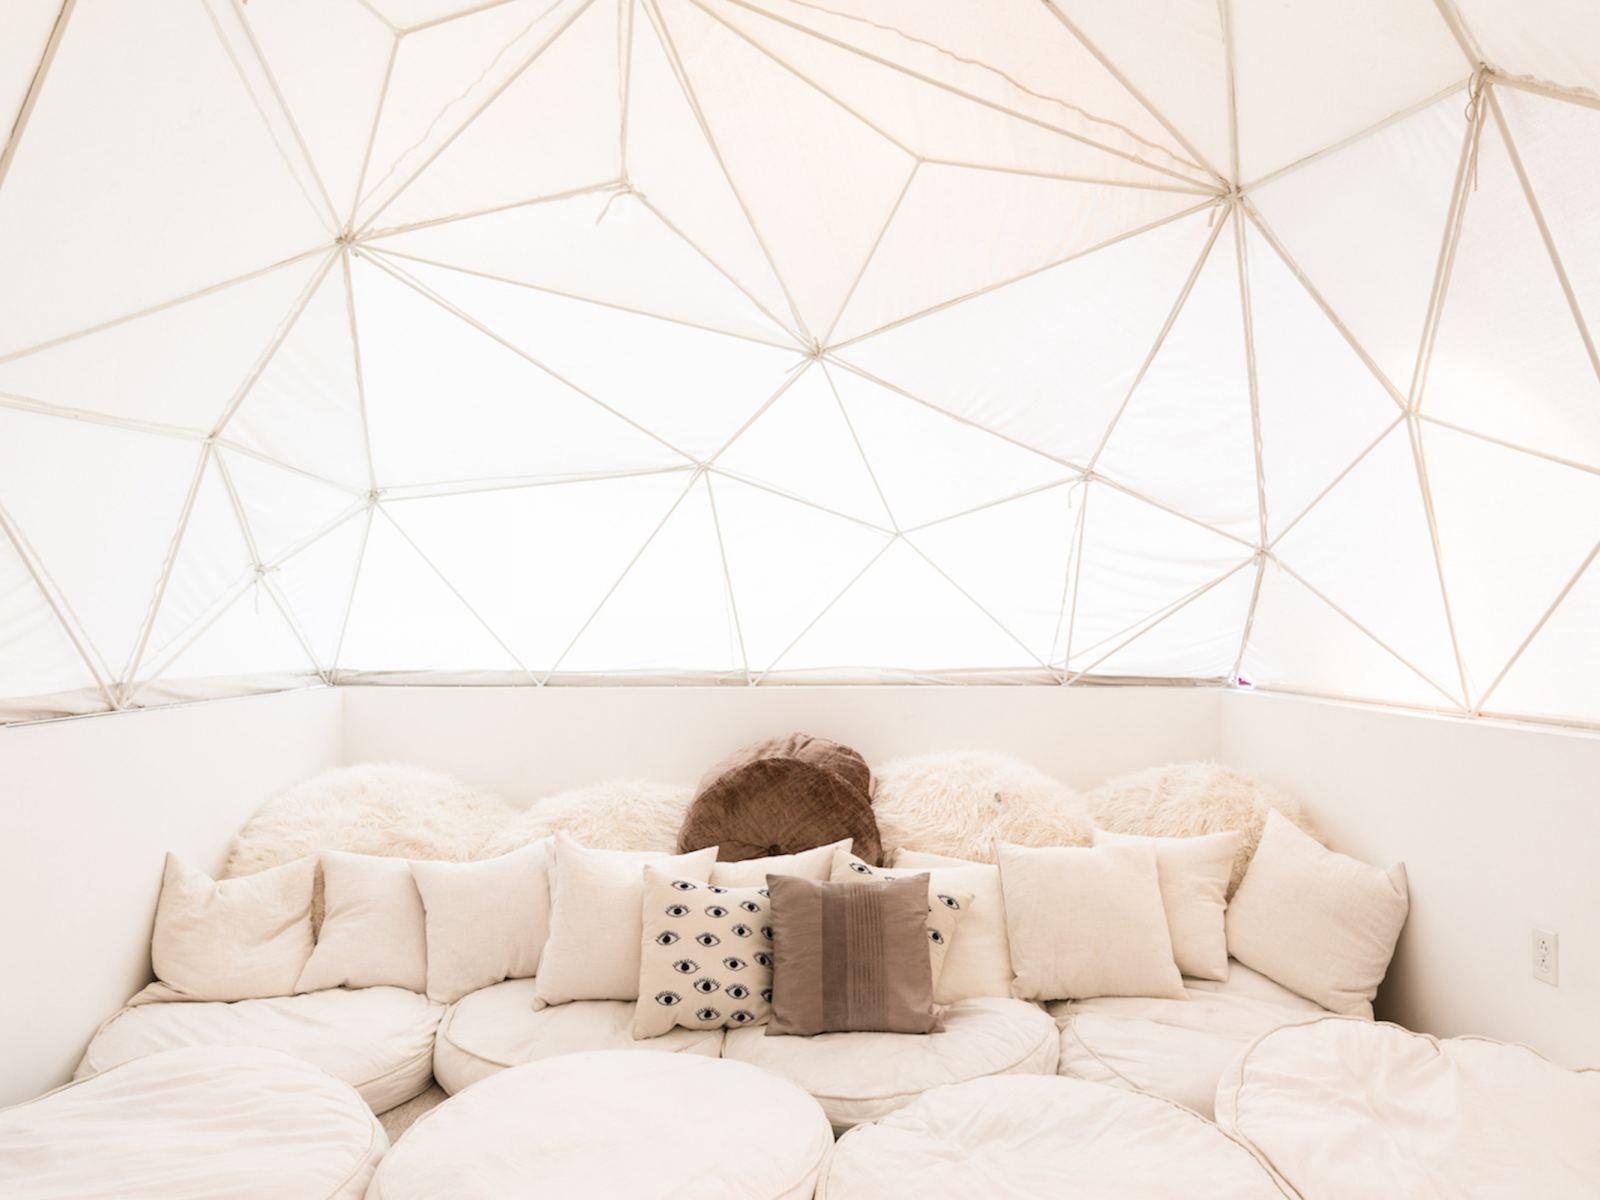 Meditation Dome